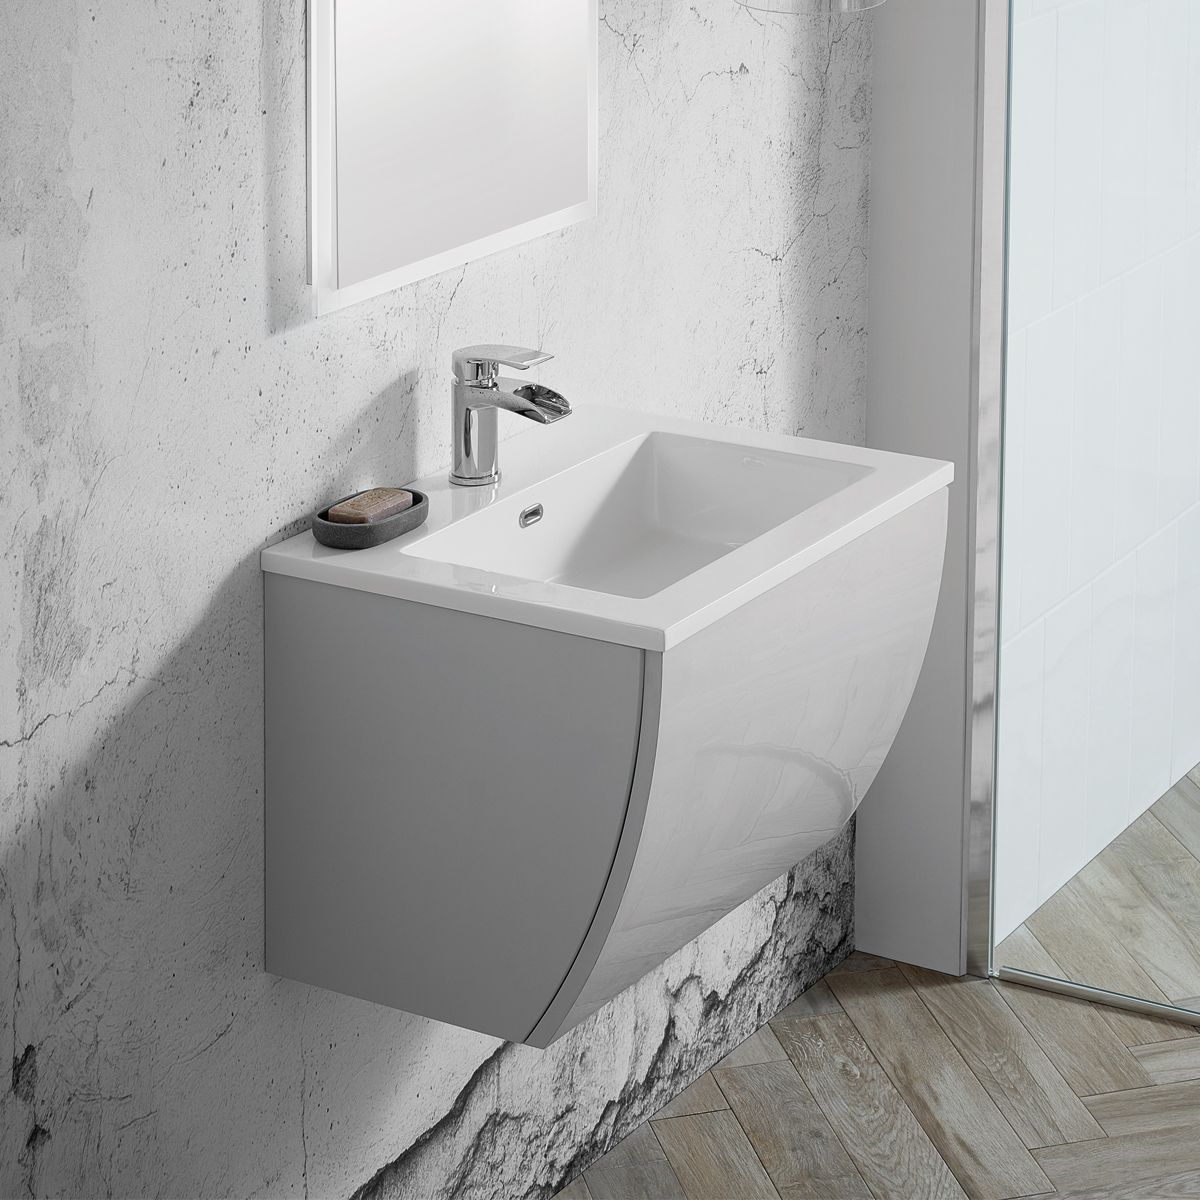 Elation Kiyo Pearl Grey Gloss Vanity Unit 550mm